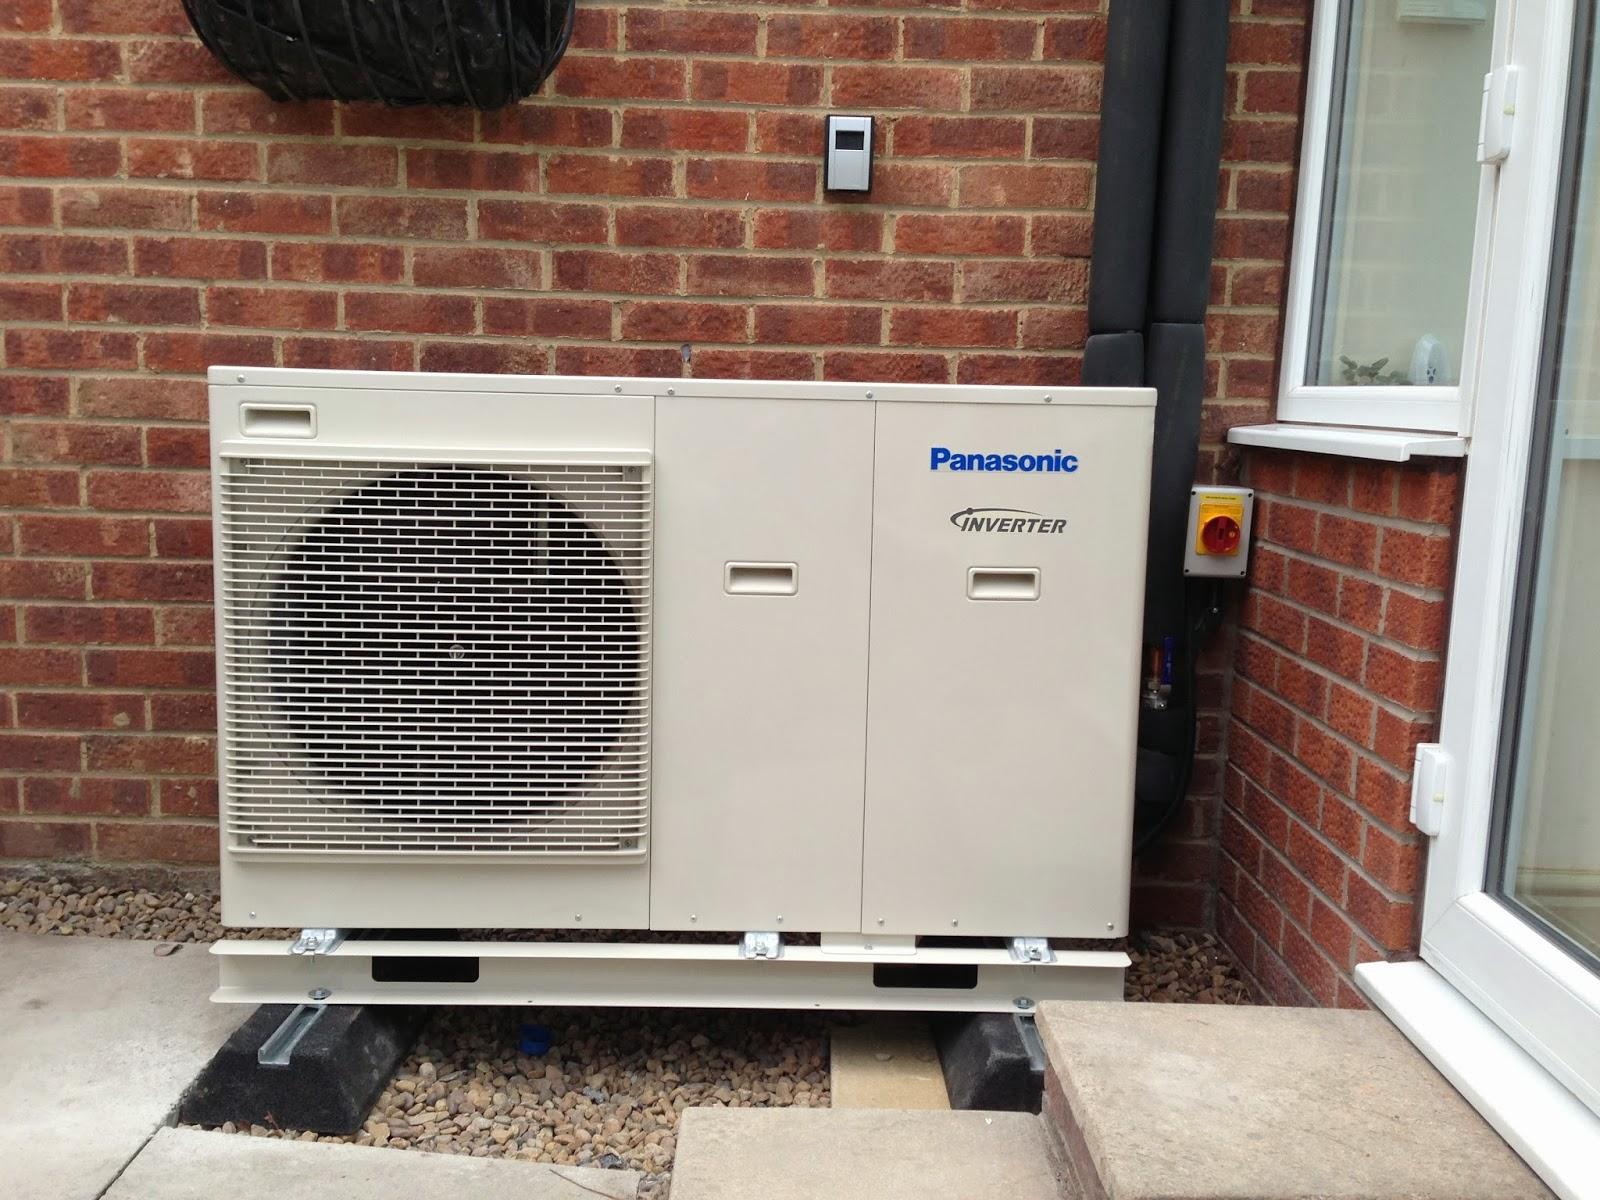 panasonic heat pump installed outside